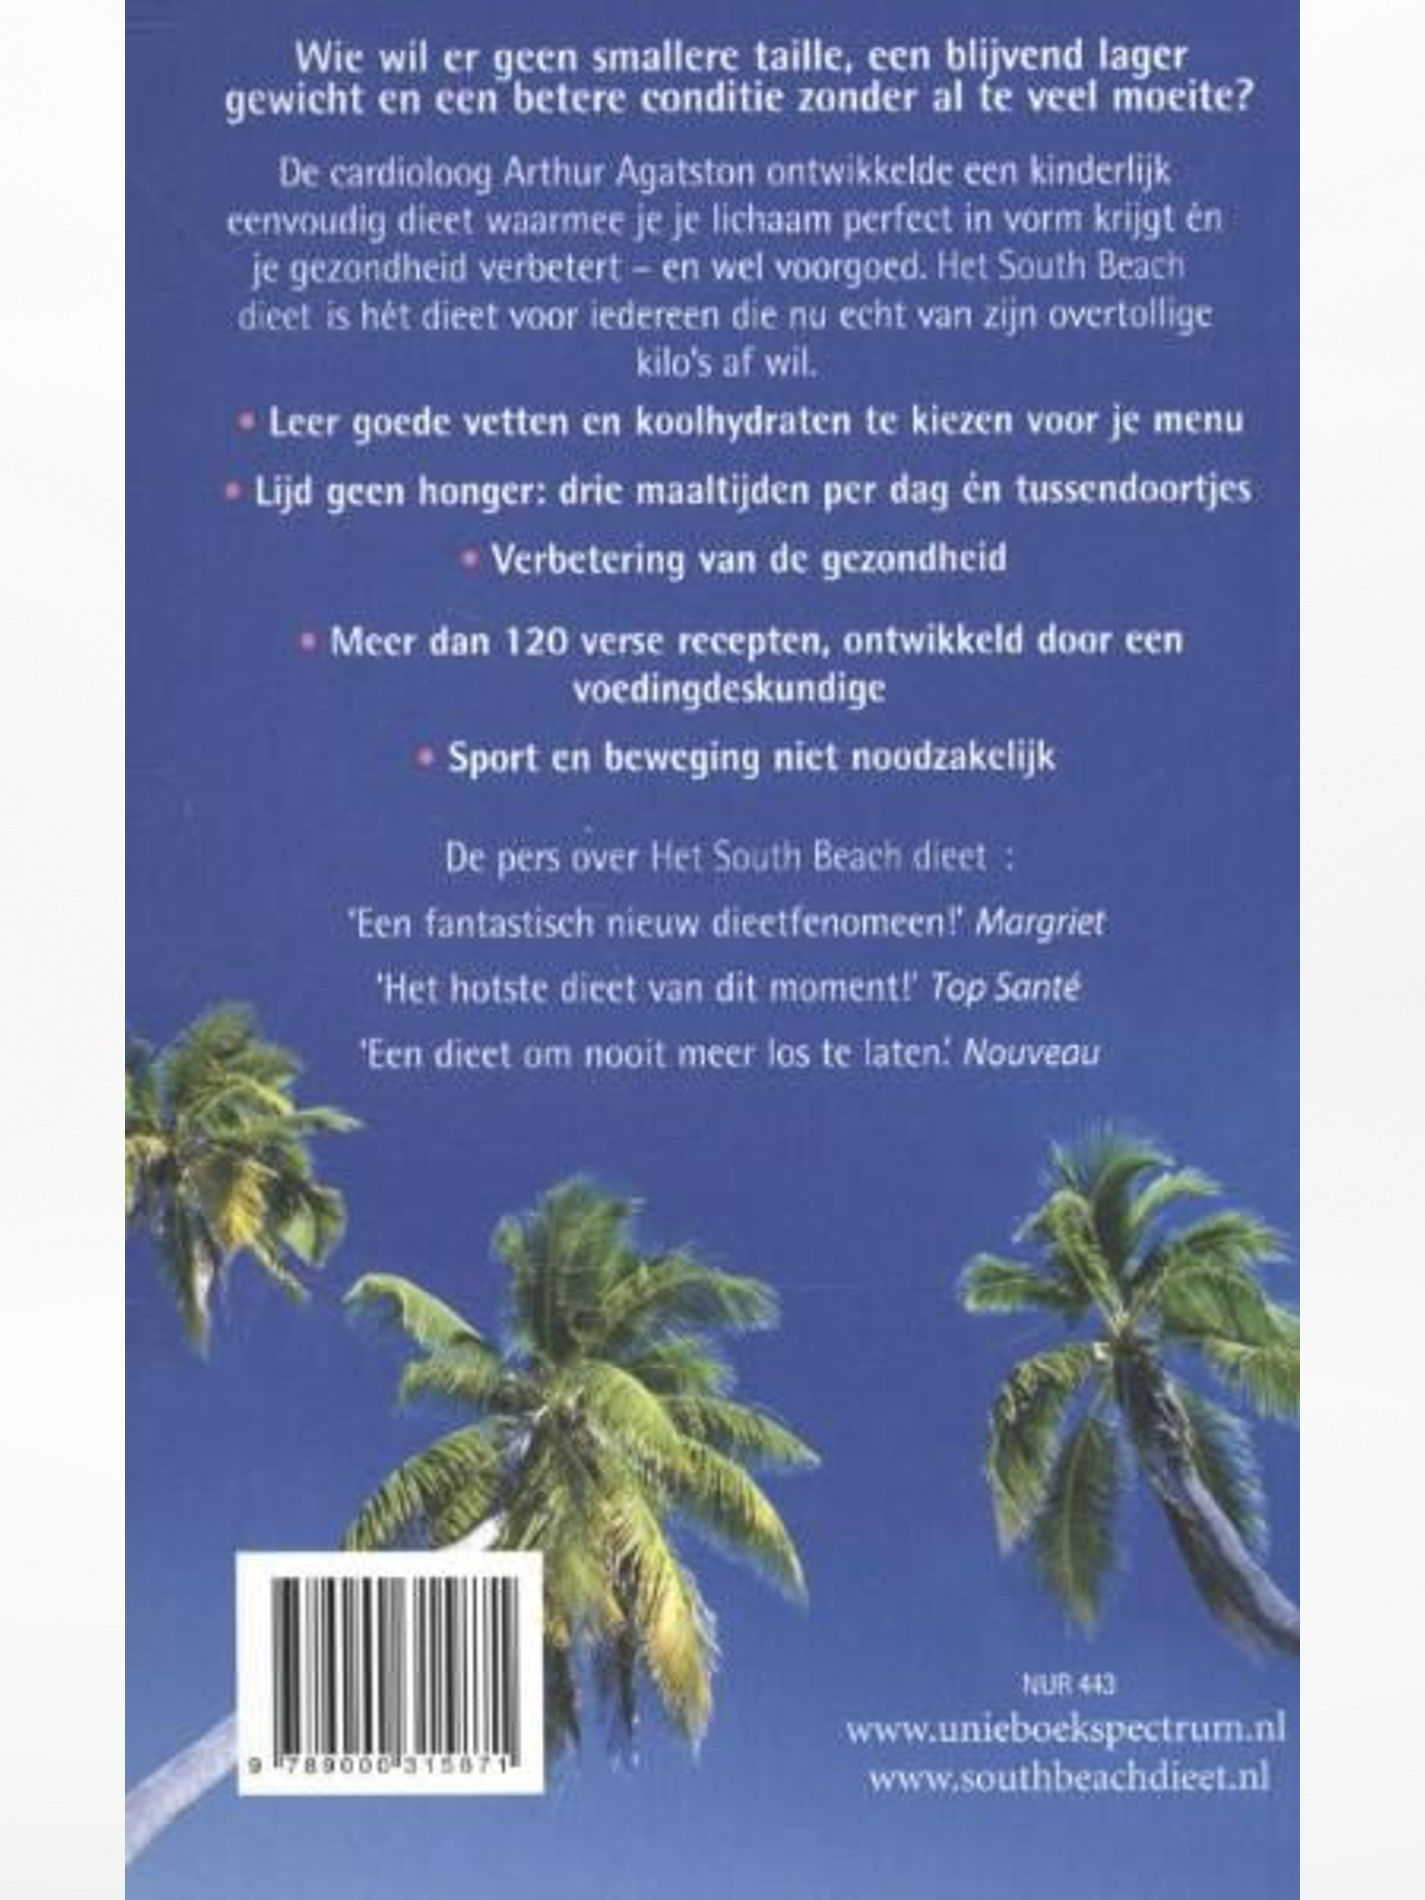 south beach dieet boek